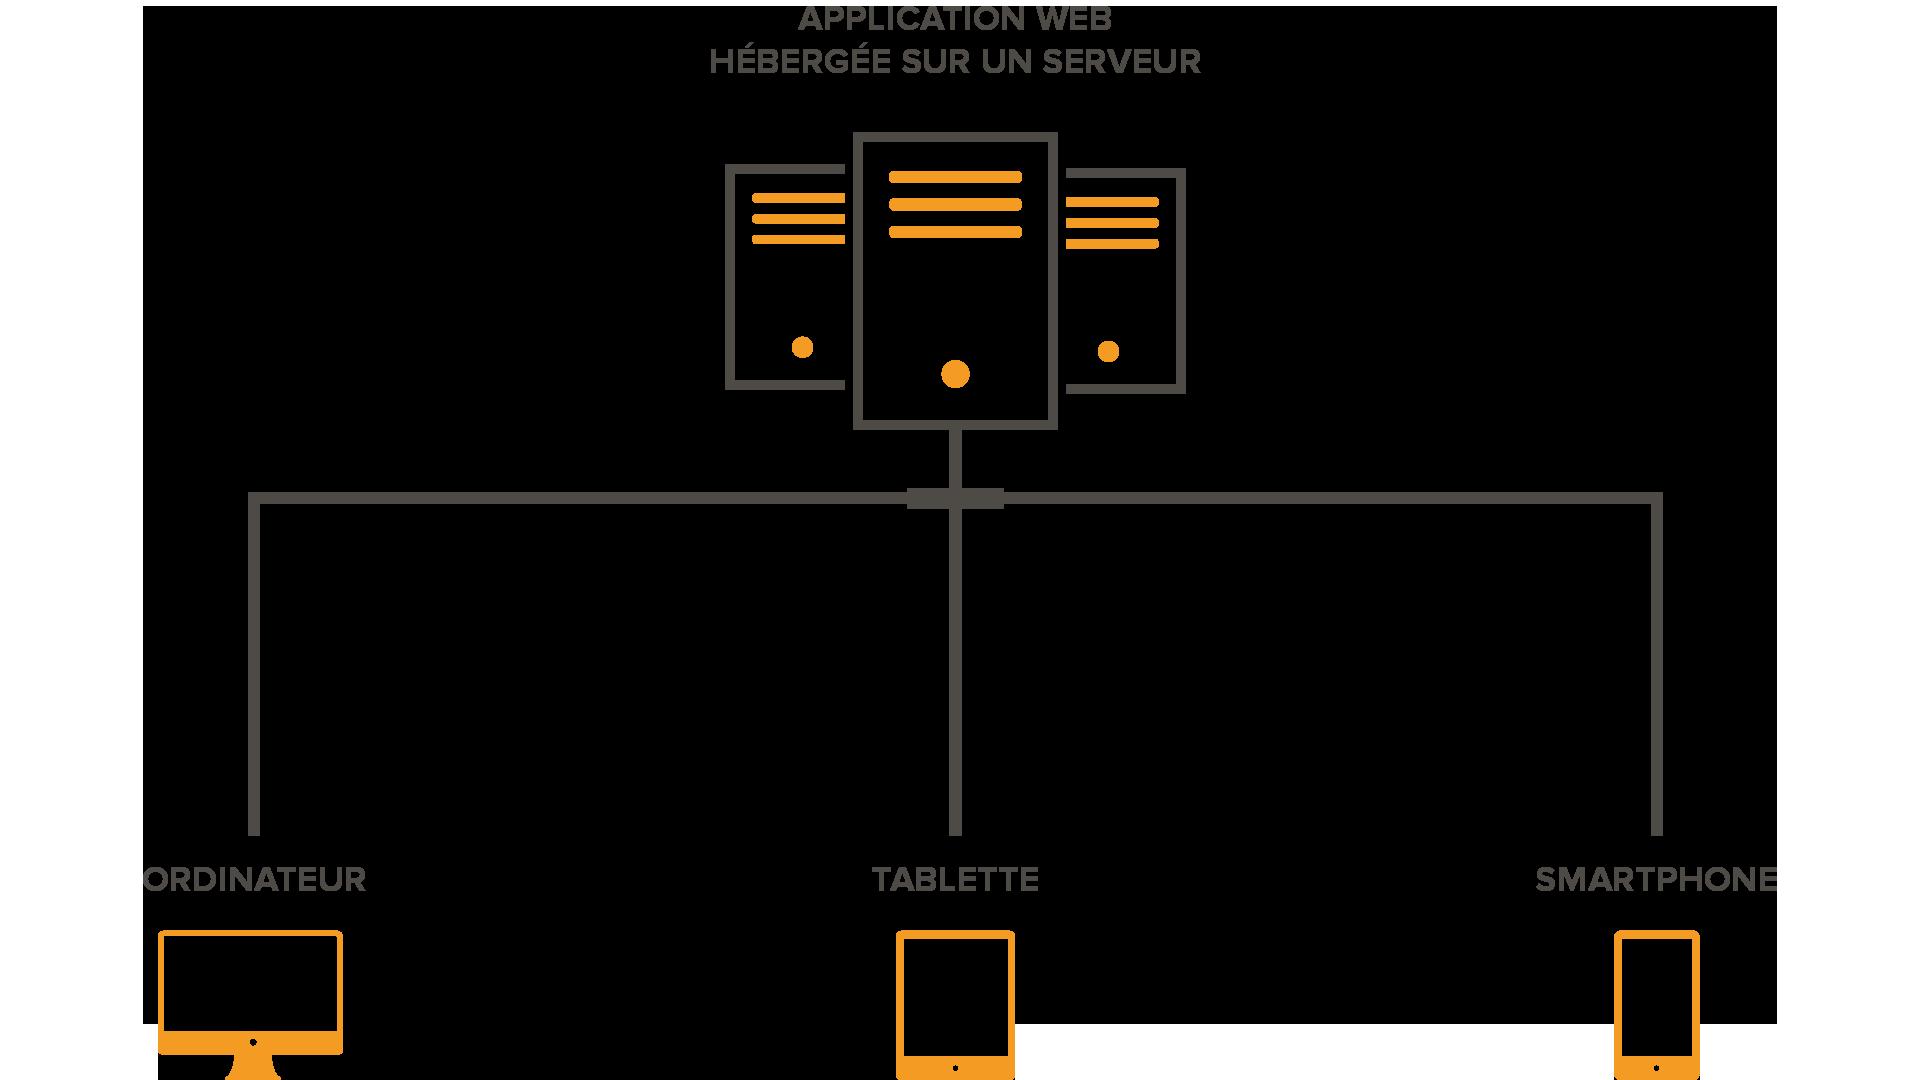 schema application web